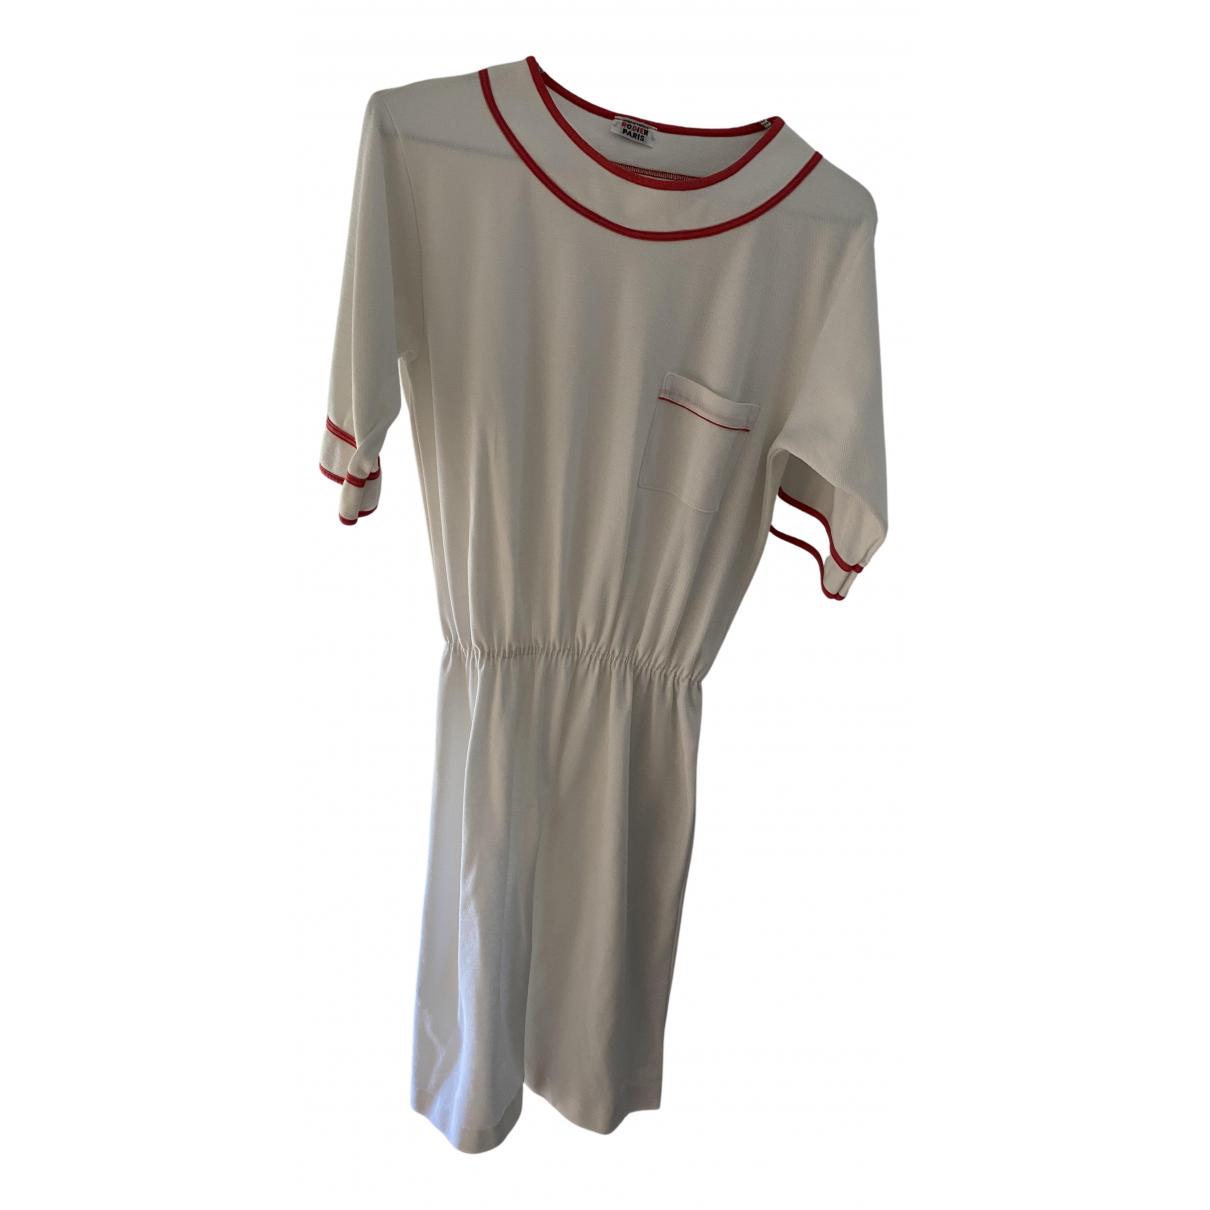 Rodier N White Cotton dress for Women 36 FR